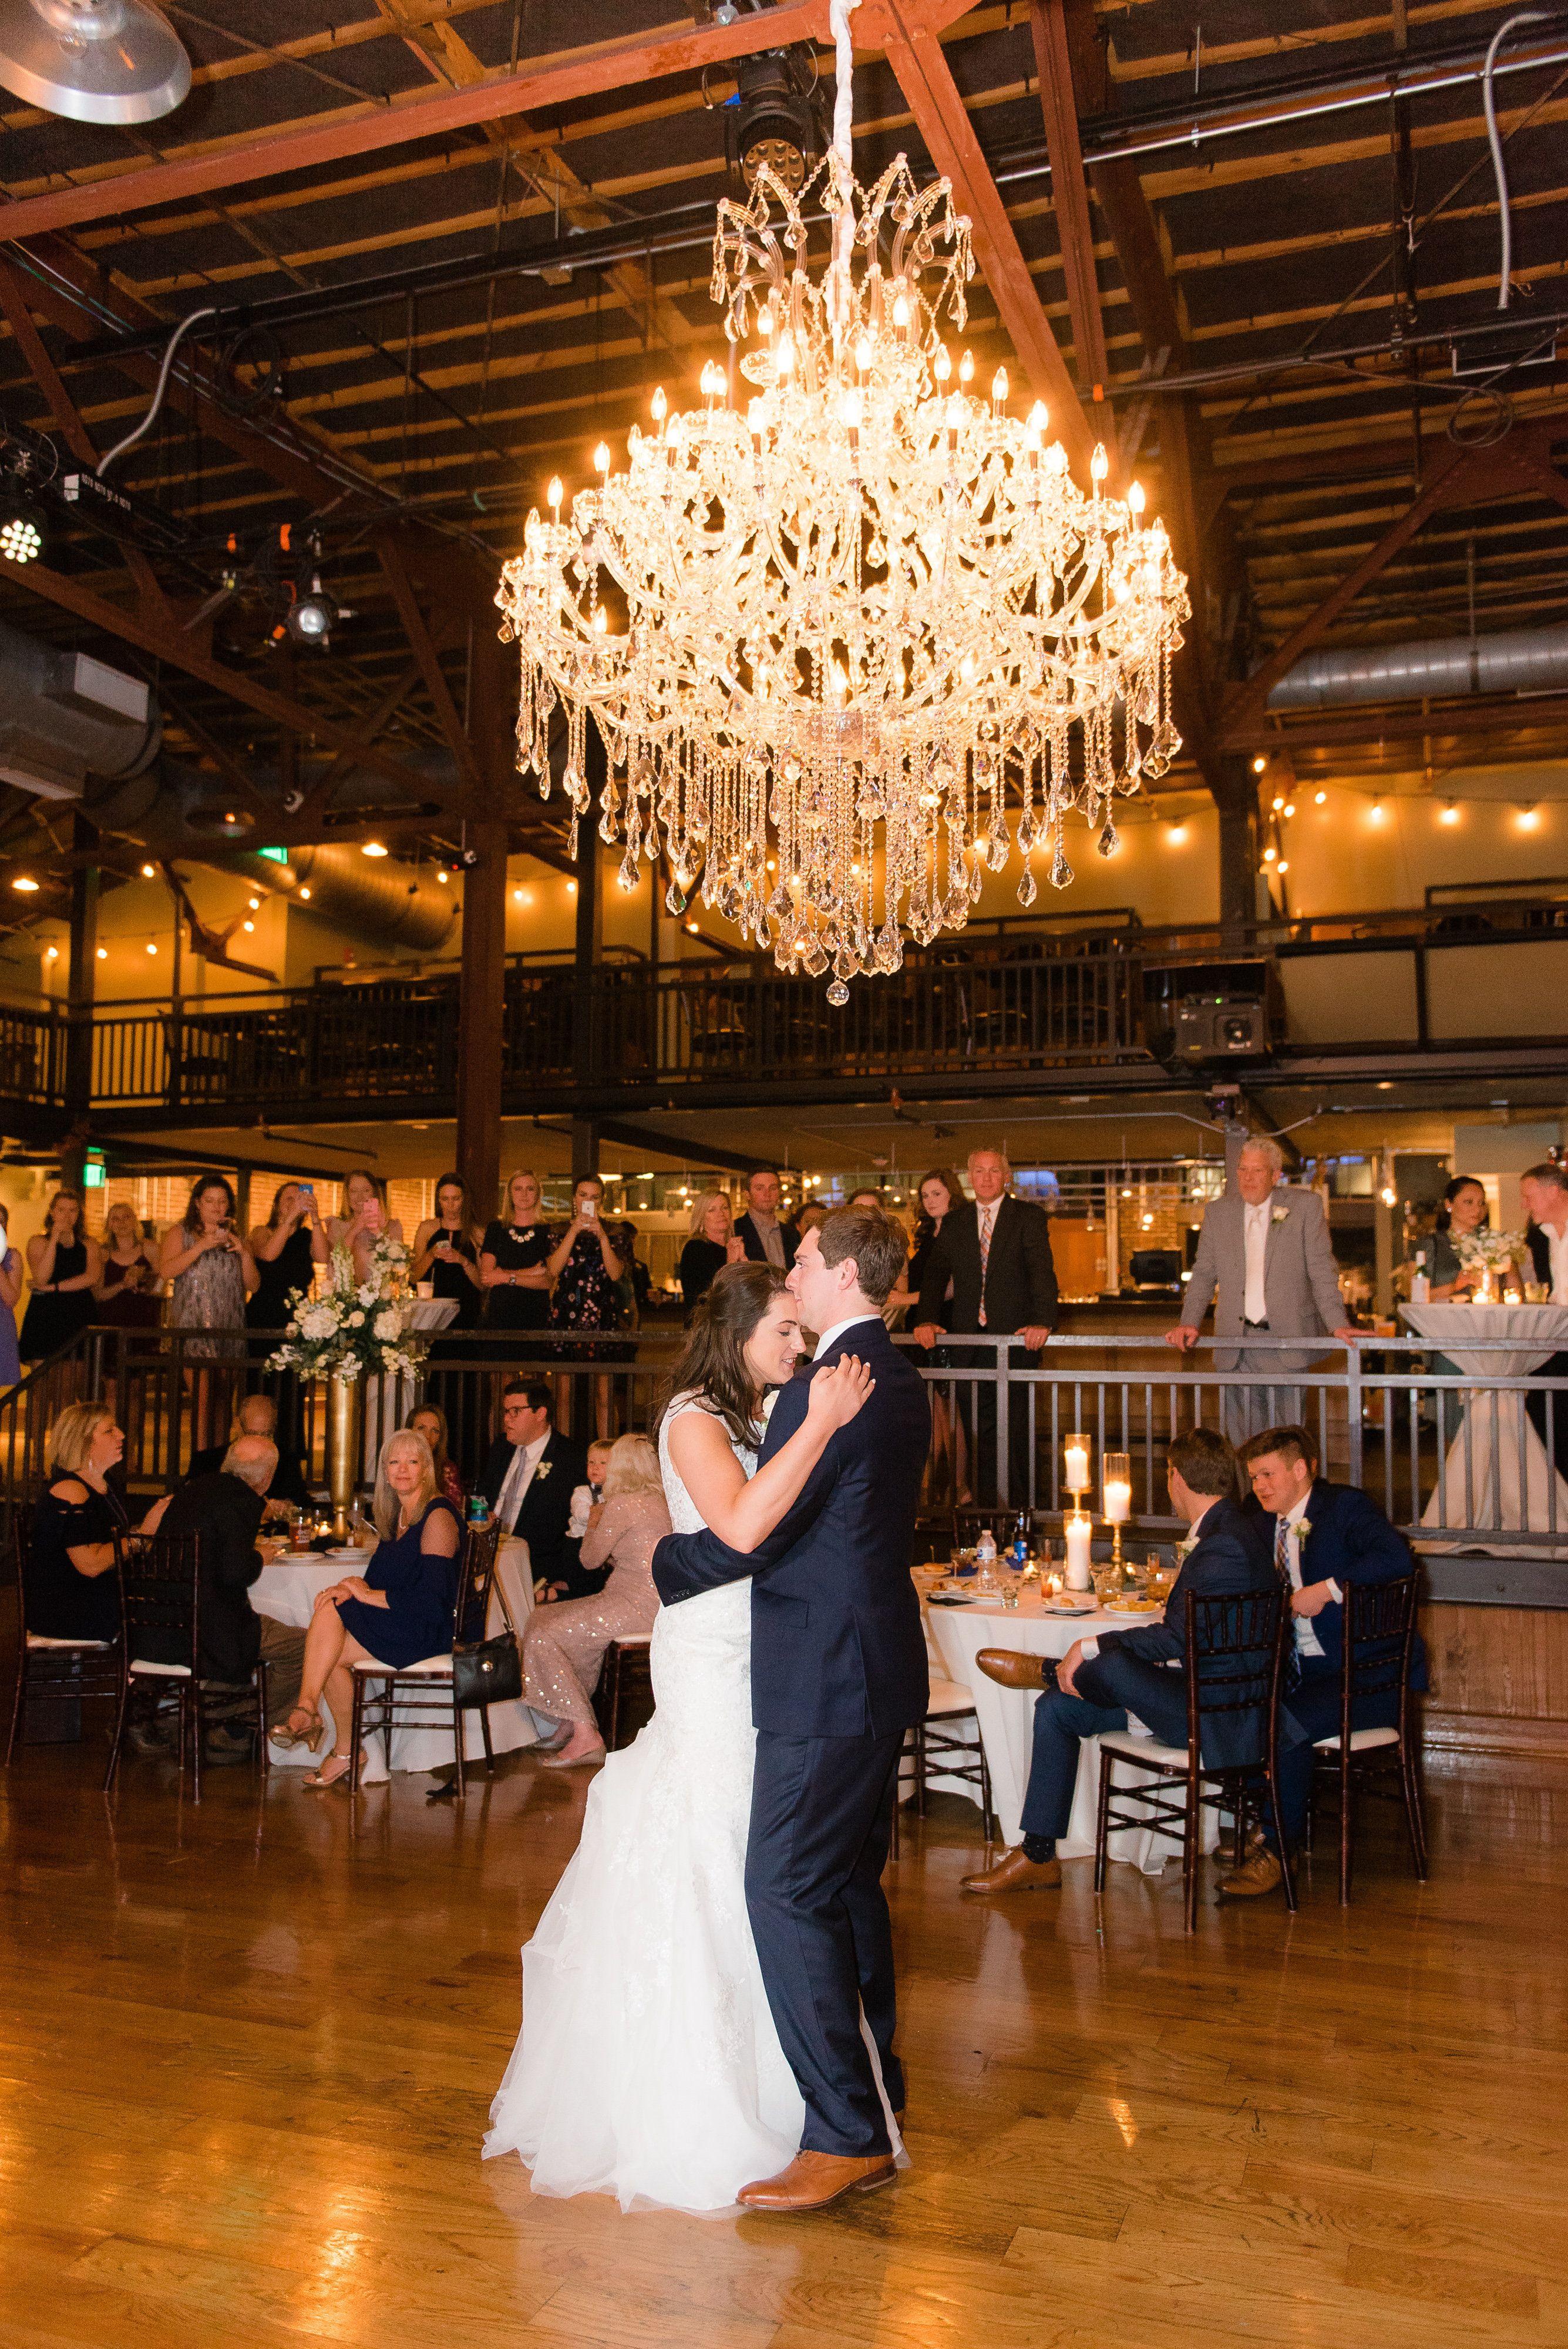 Filmore Jaudon Wedding / Eric & Jamie Photography